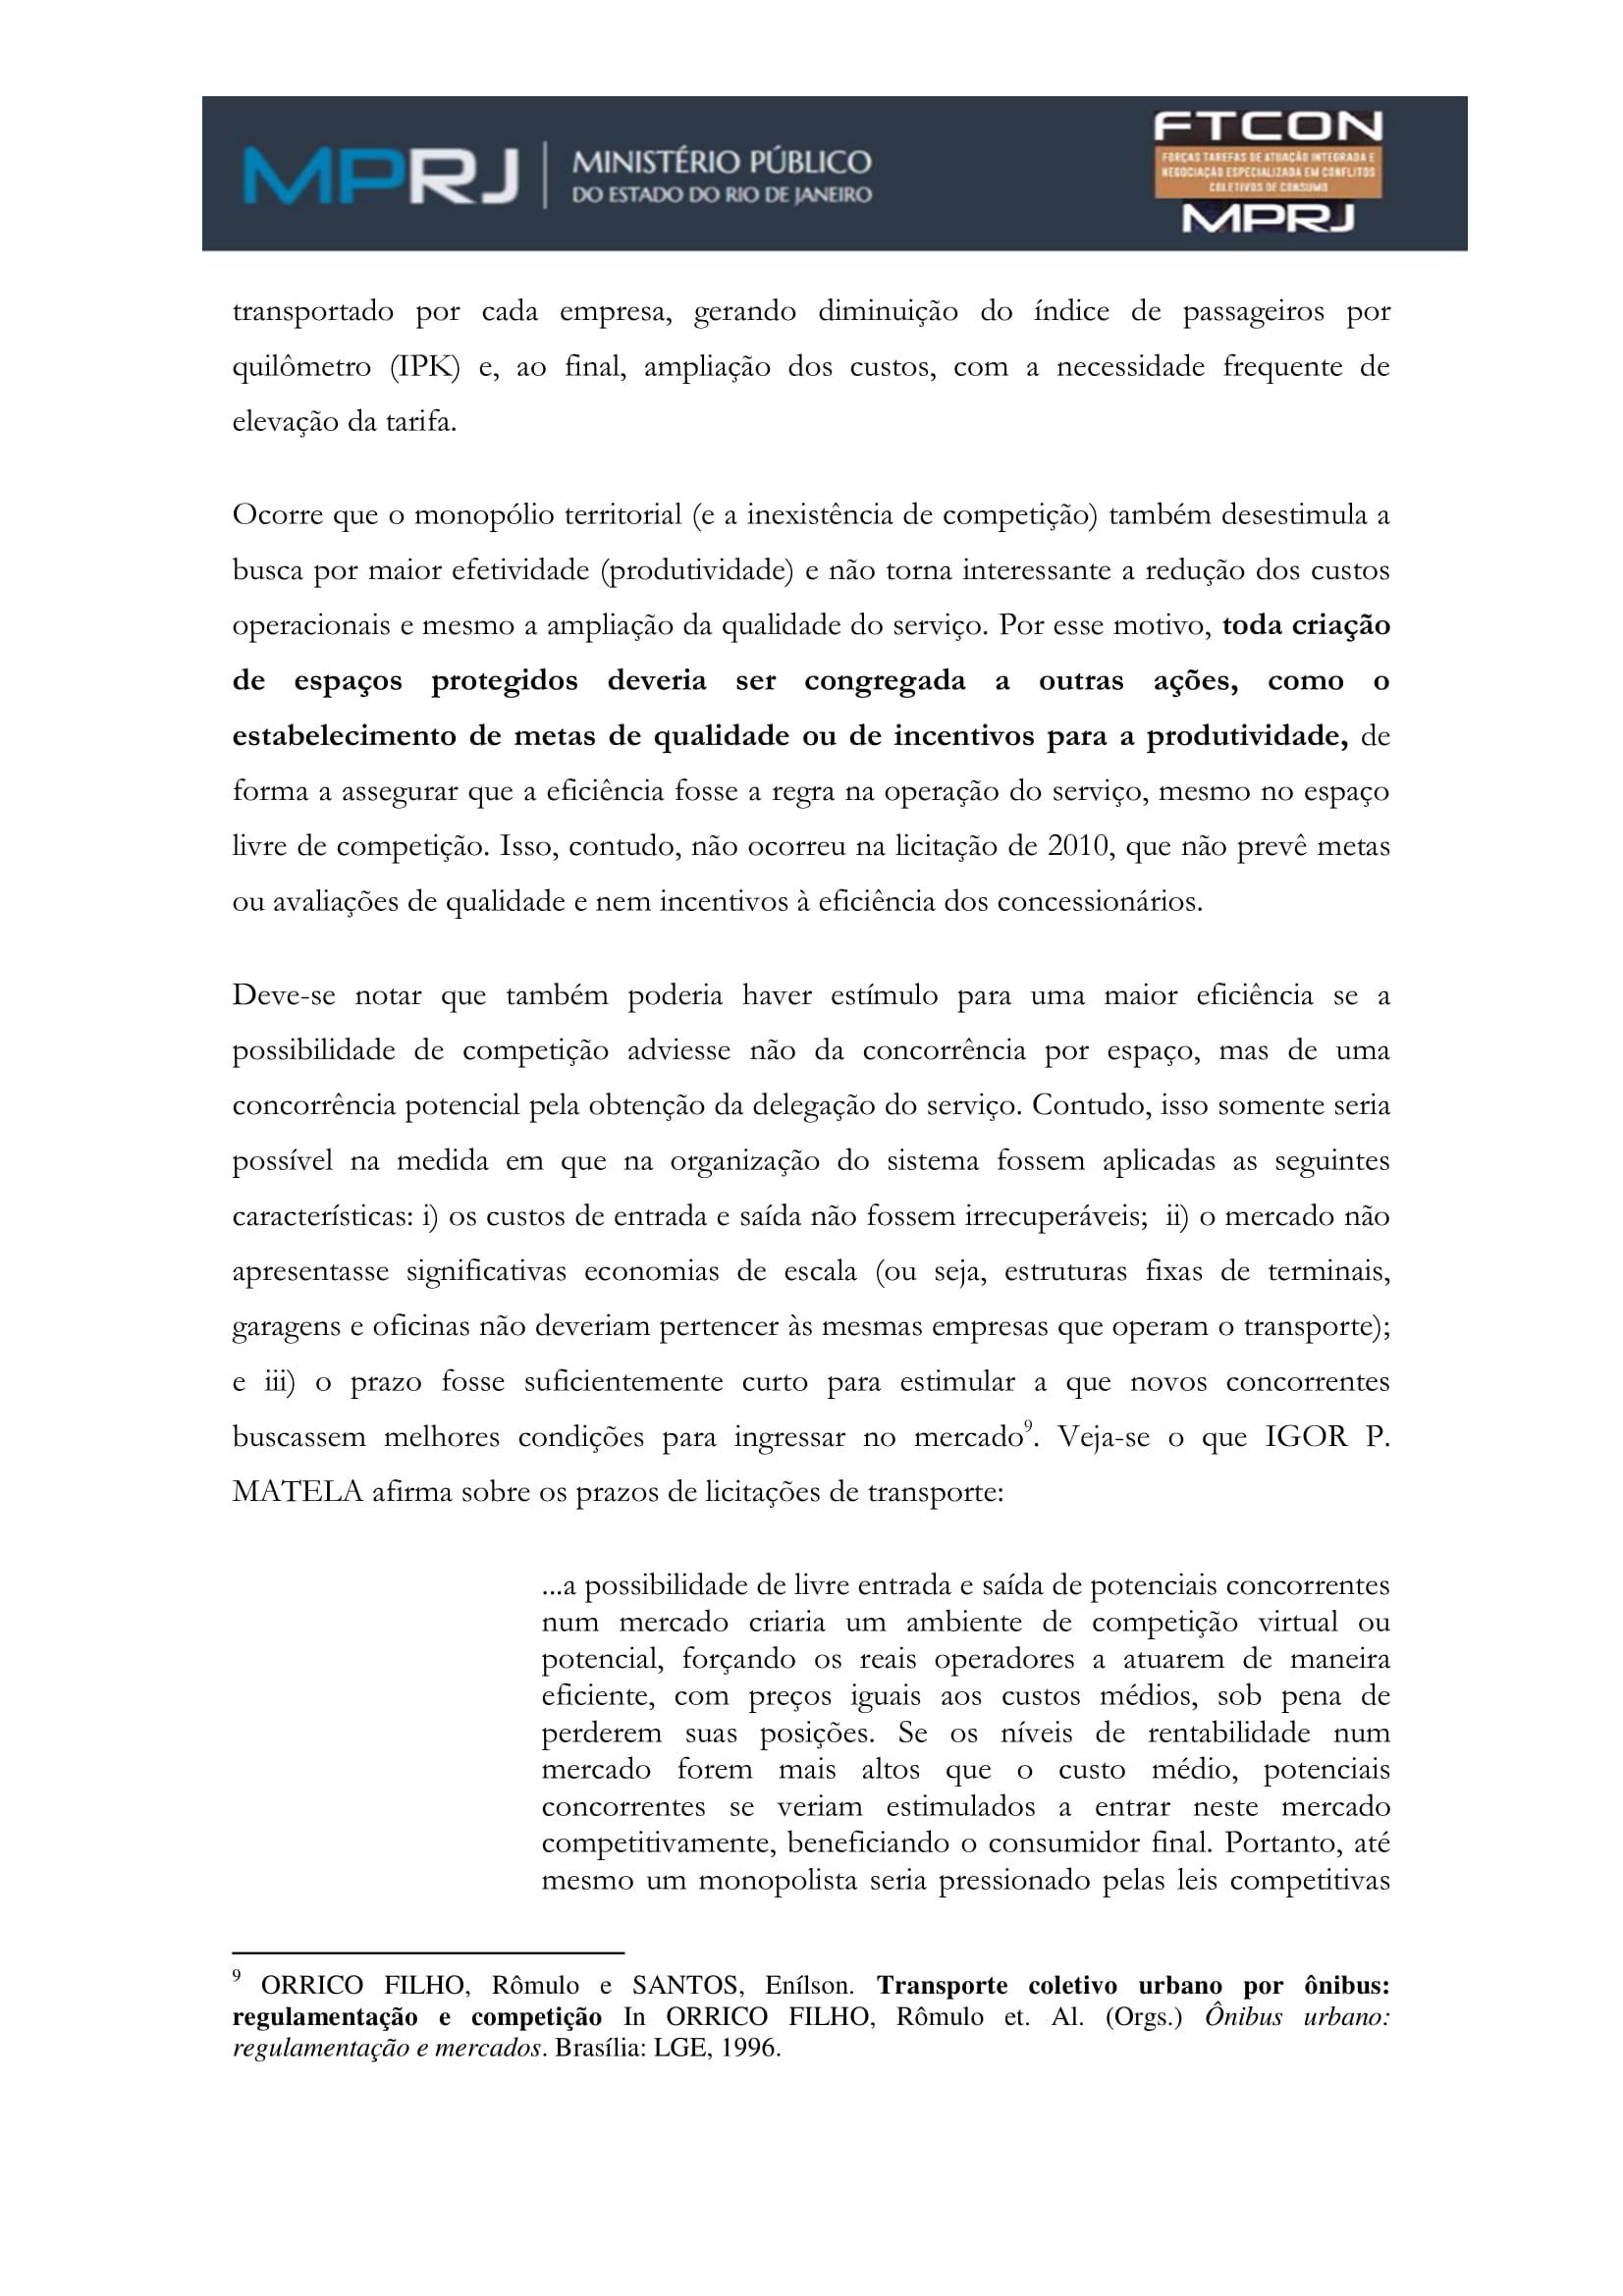 acp_caducidade_onibus_dr_rt-012